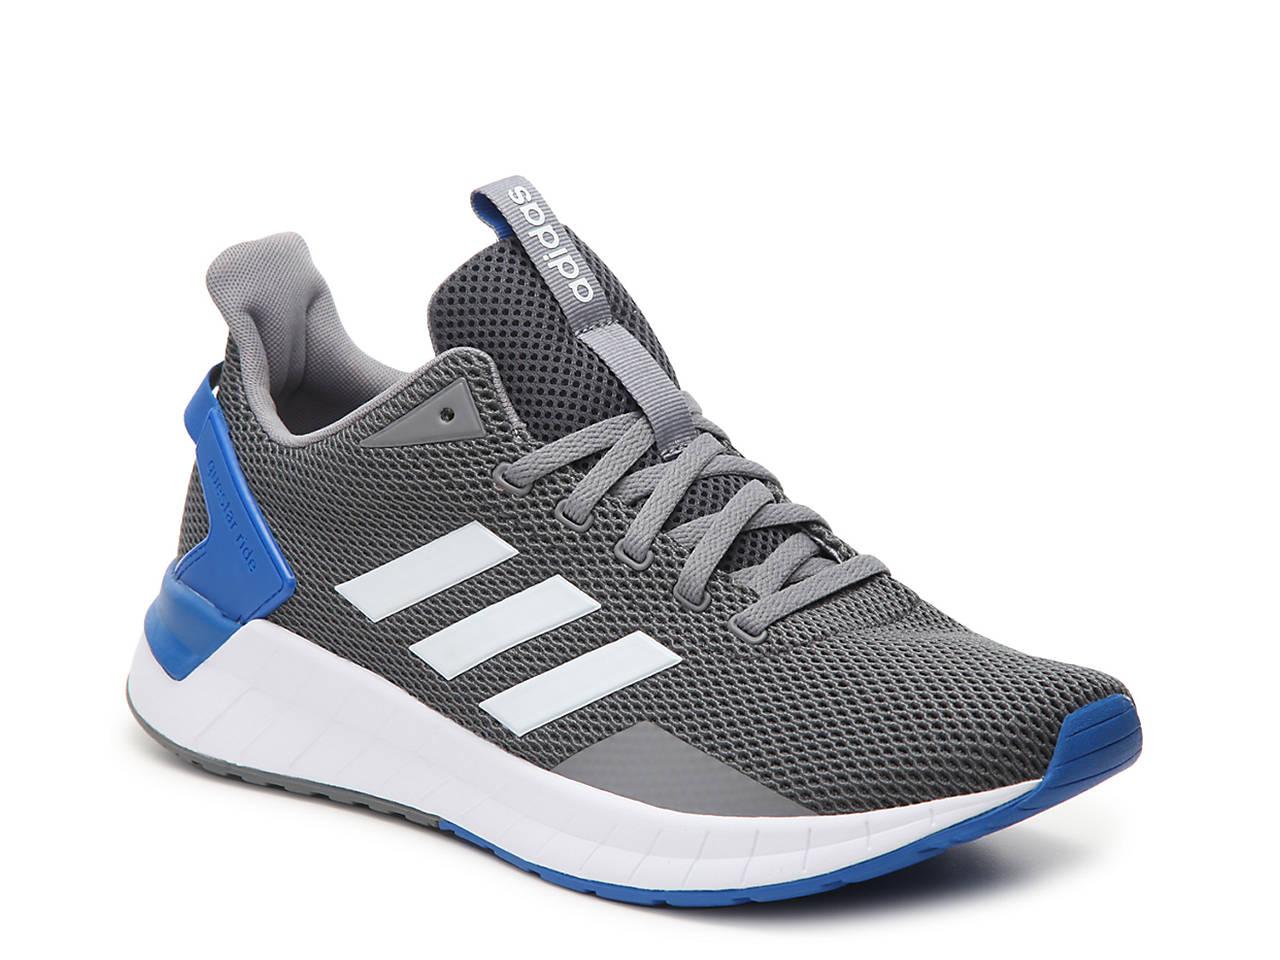 adidas Questar Ride Running Shoe Men's Men's Shoes | DSW